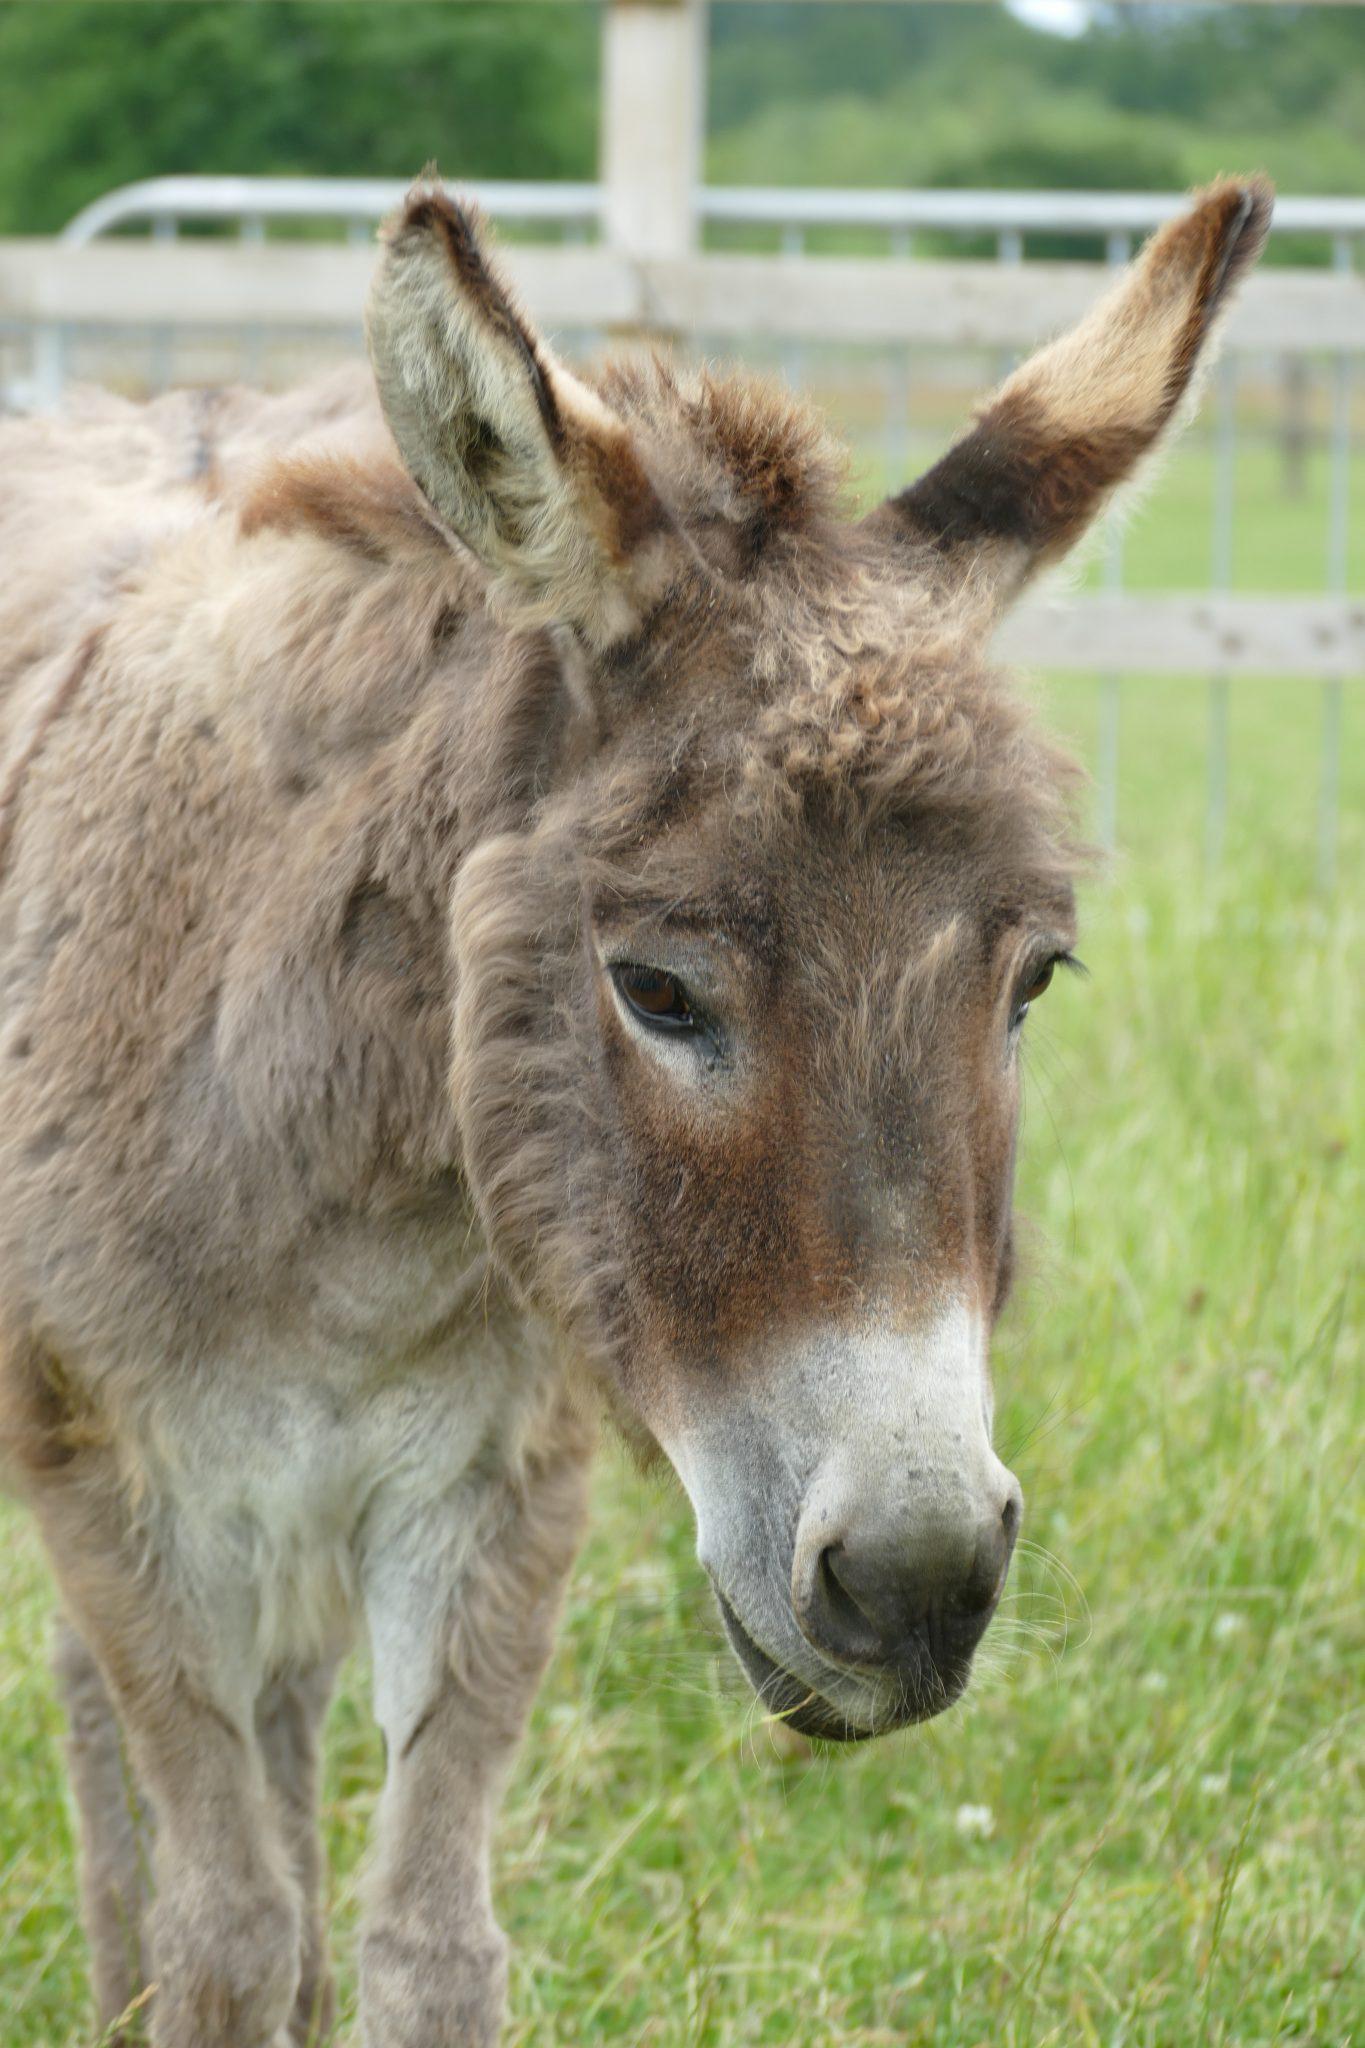 angel-wonkey-donkey-visitors-centre